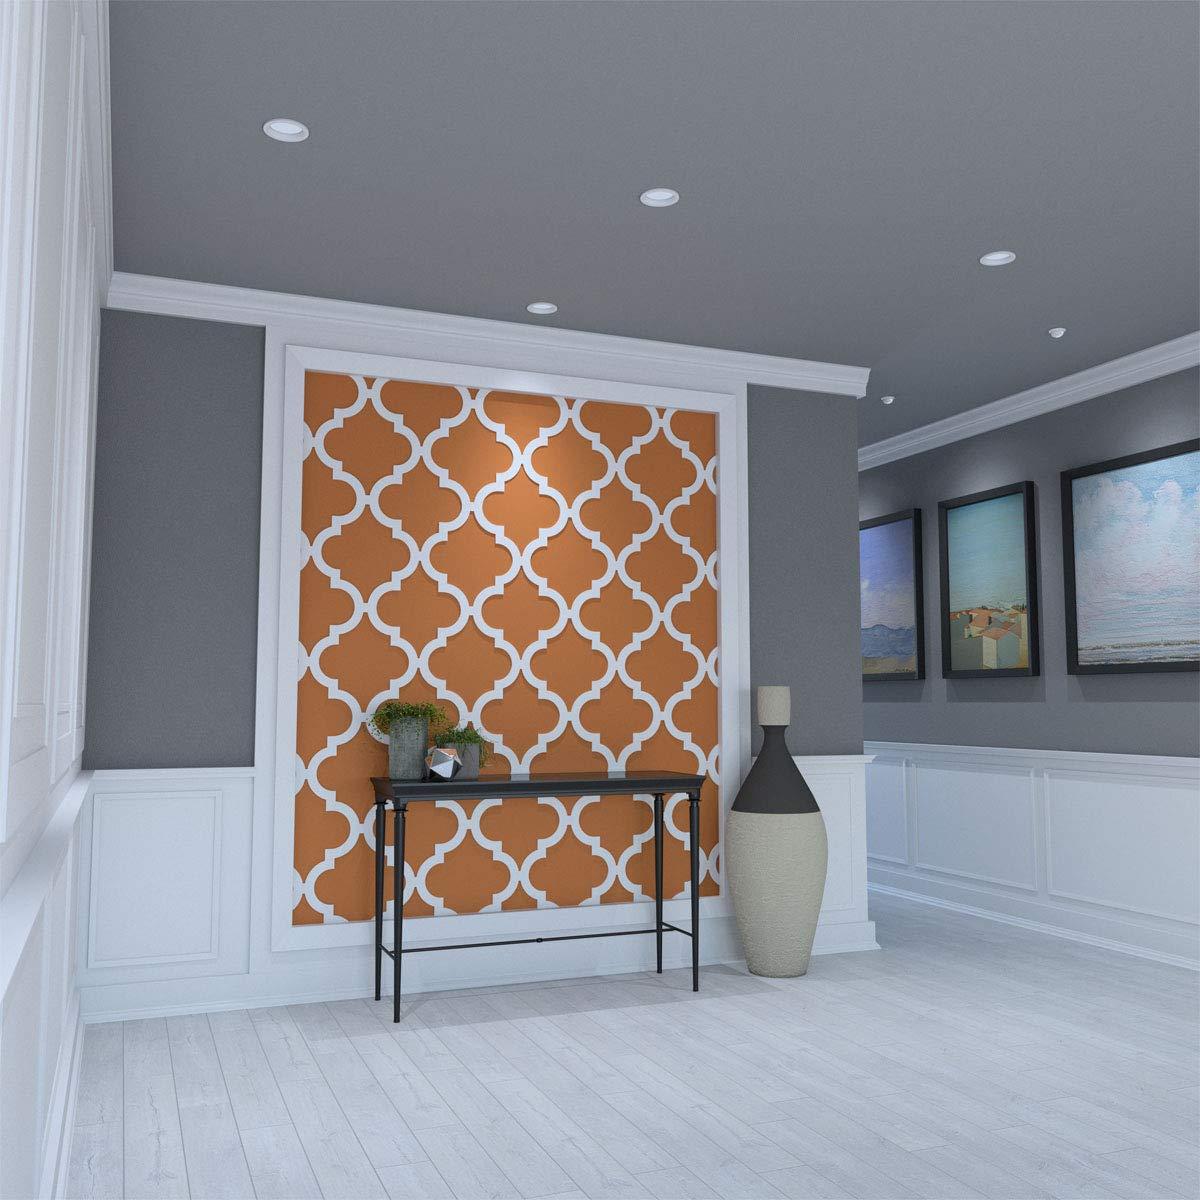 23-3//4W x 23-3//4H Ekena Millwork WALP24X24MRK-CASE-10 Wall Panel White